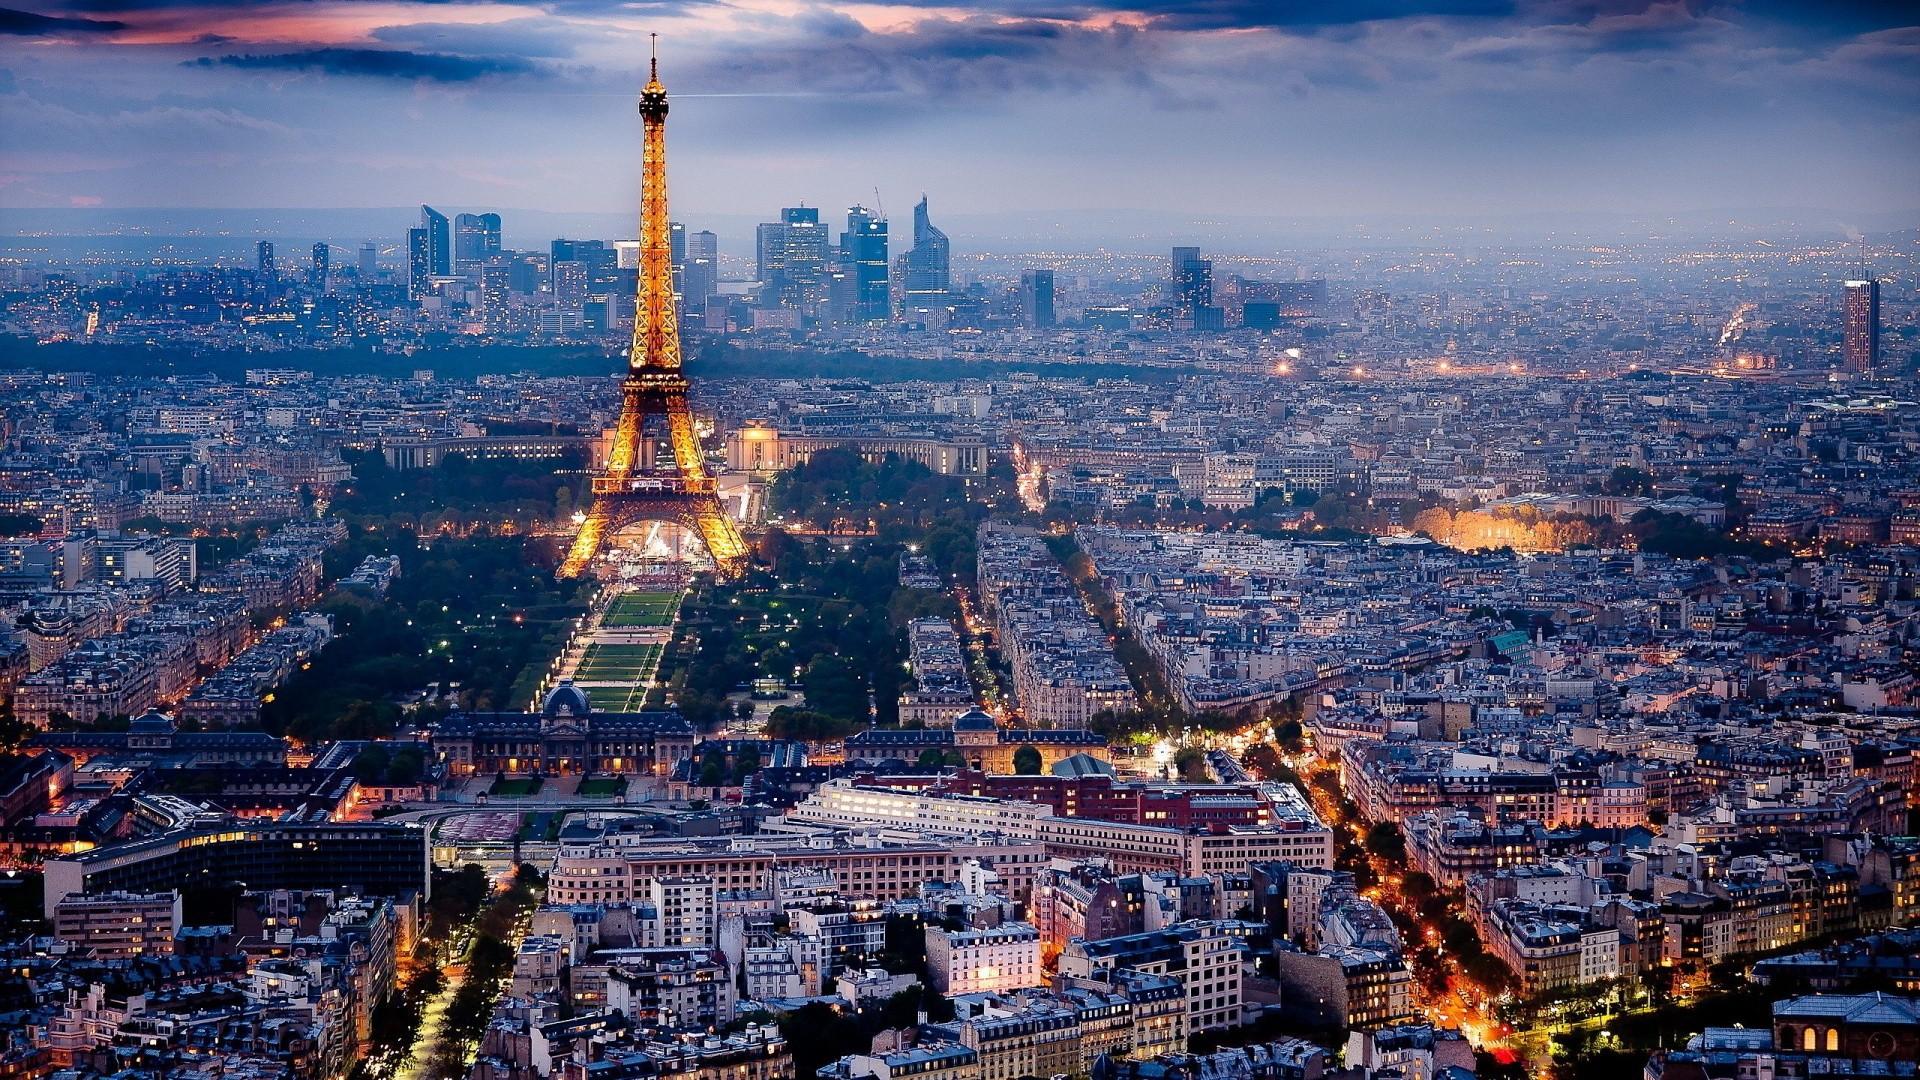 Paris Desktop Wallpaper Hd 71 Images